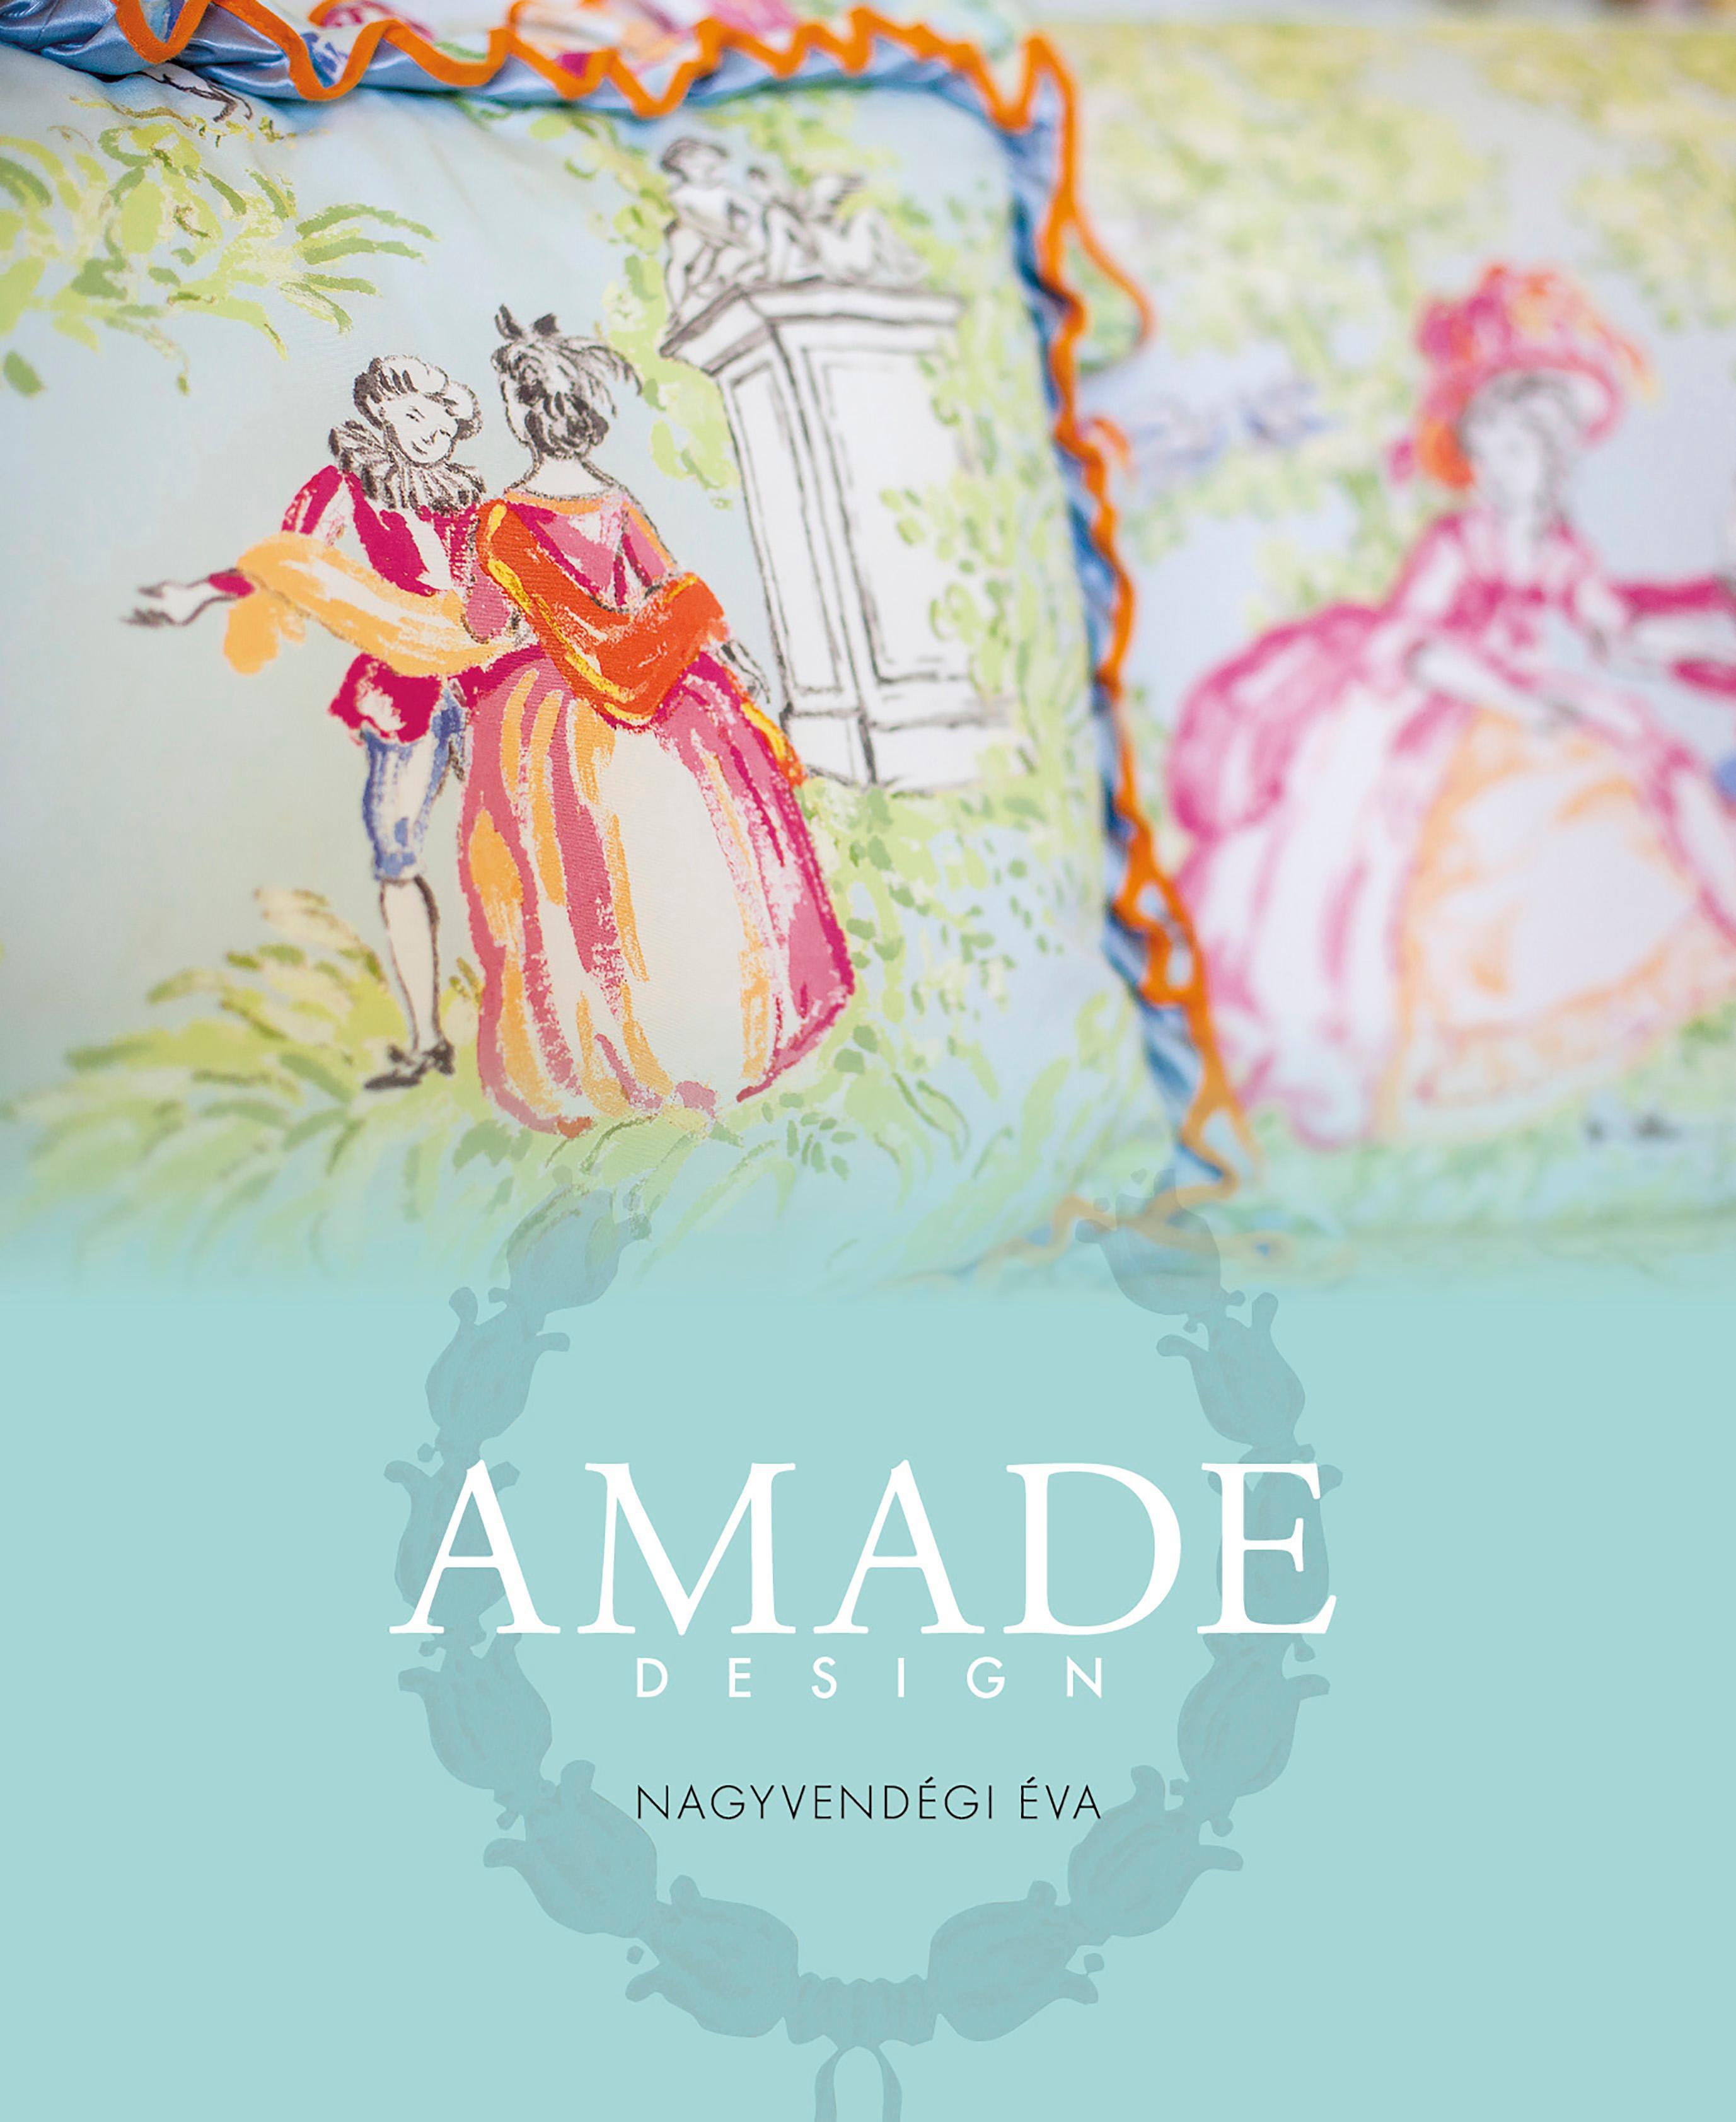 AMADE - DESIGN